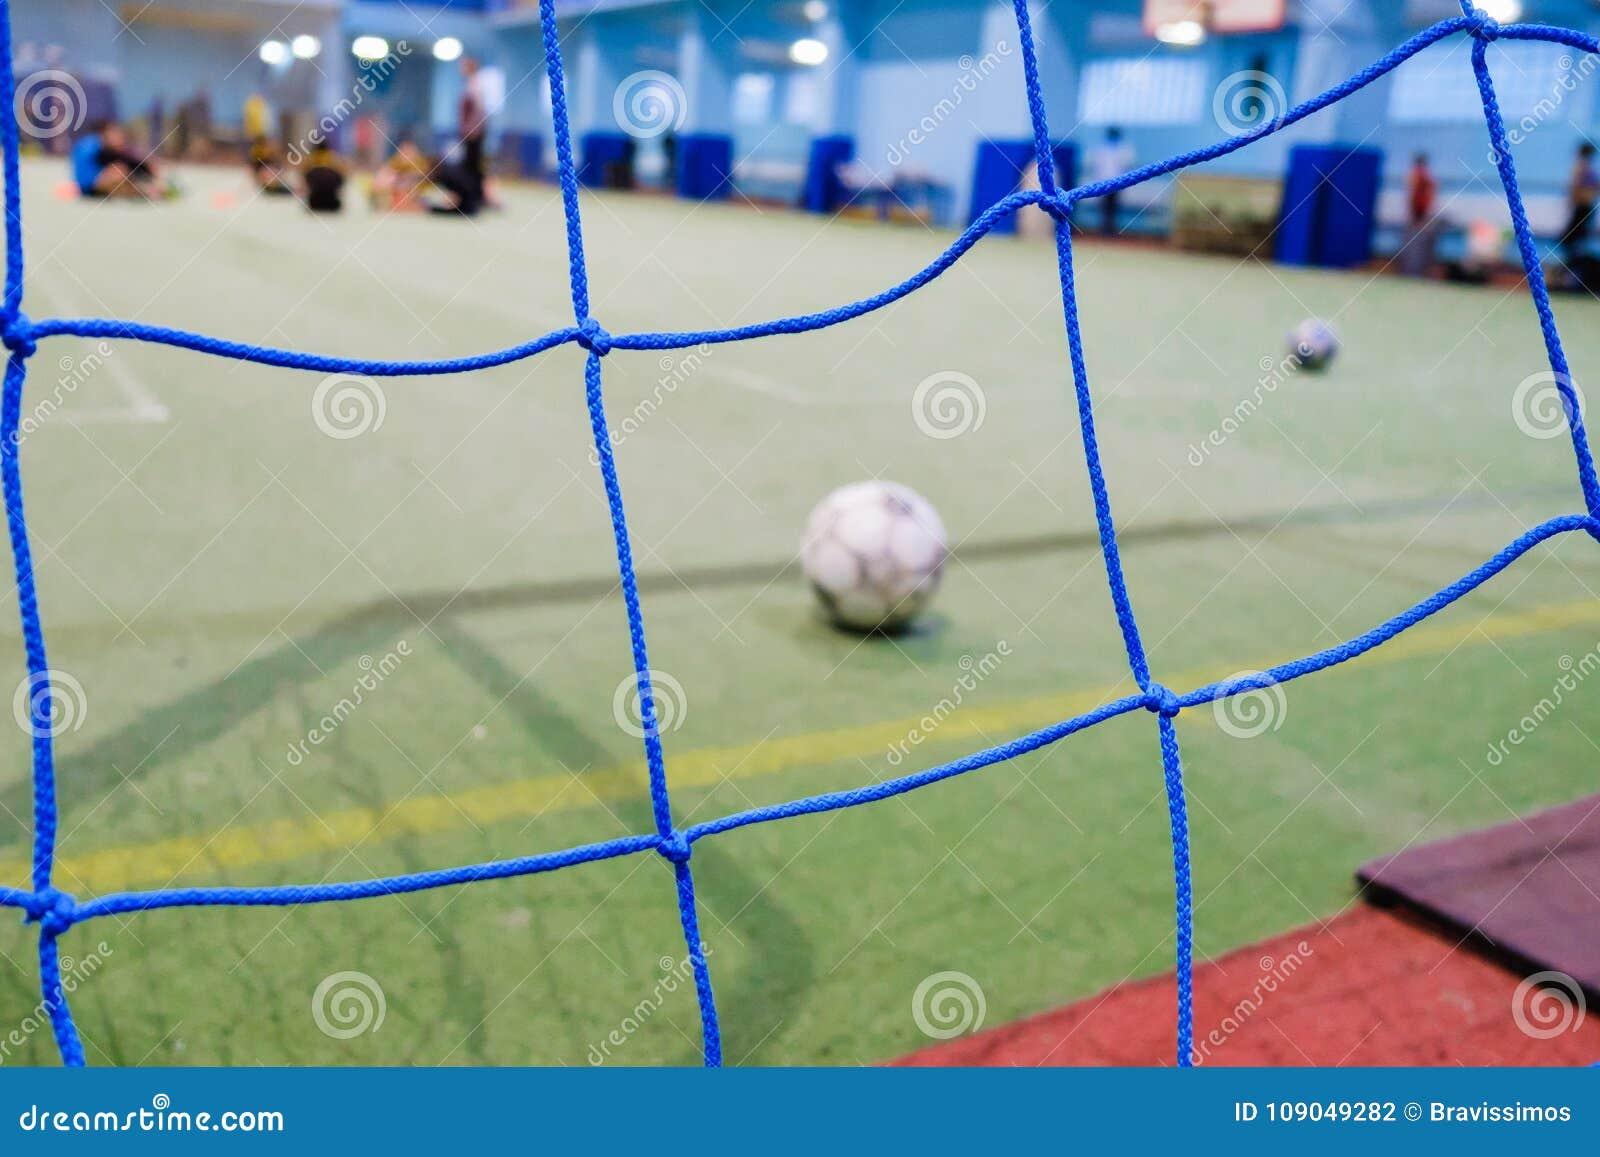 Close-up do mini poste futsal do futebol, grama artificial